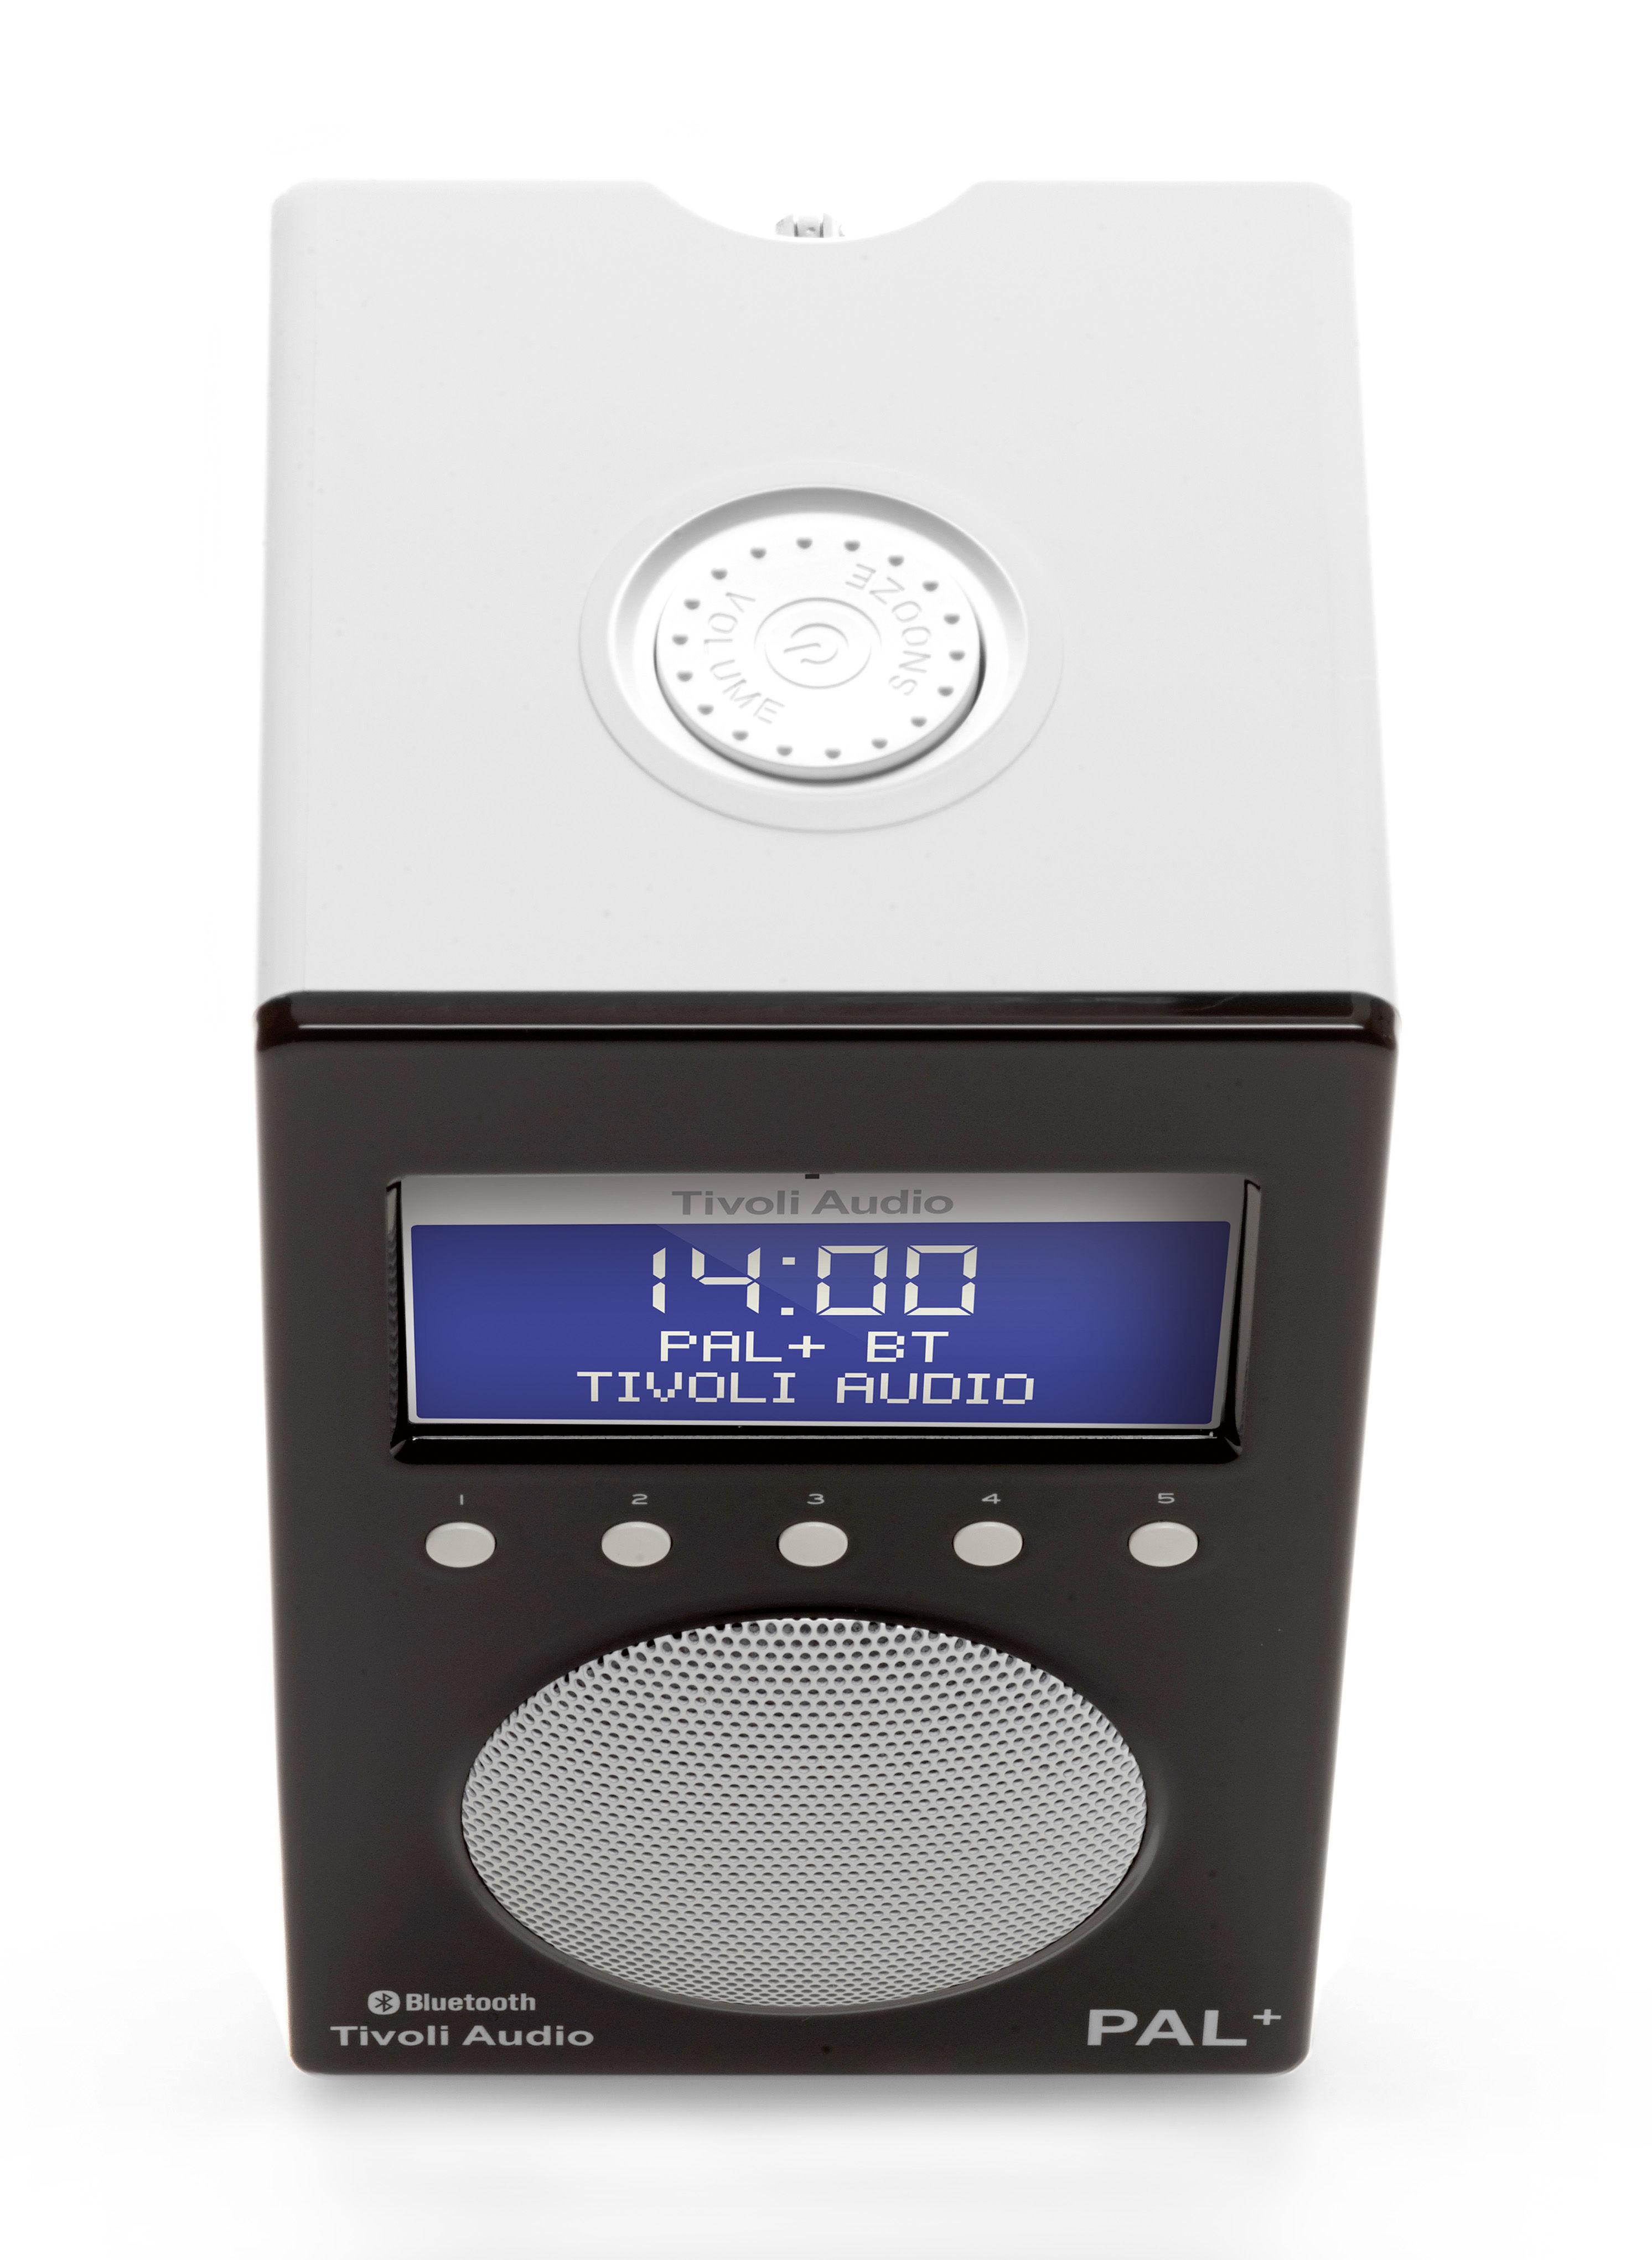 radio pal bt enceinte portative bluetooth tuner digital noir blanc tivoli audio. Black Bedroom Furniture Sets. Home Design Ideas